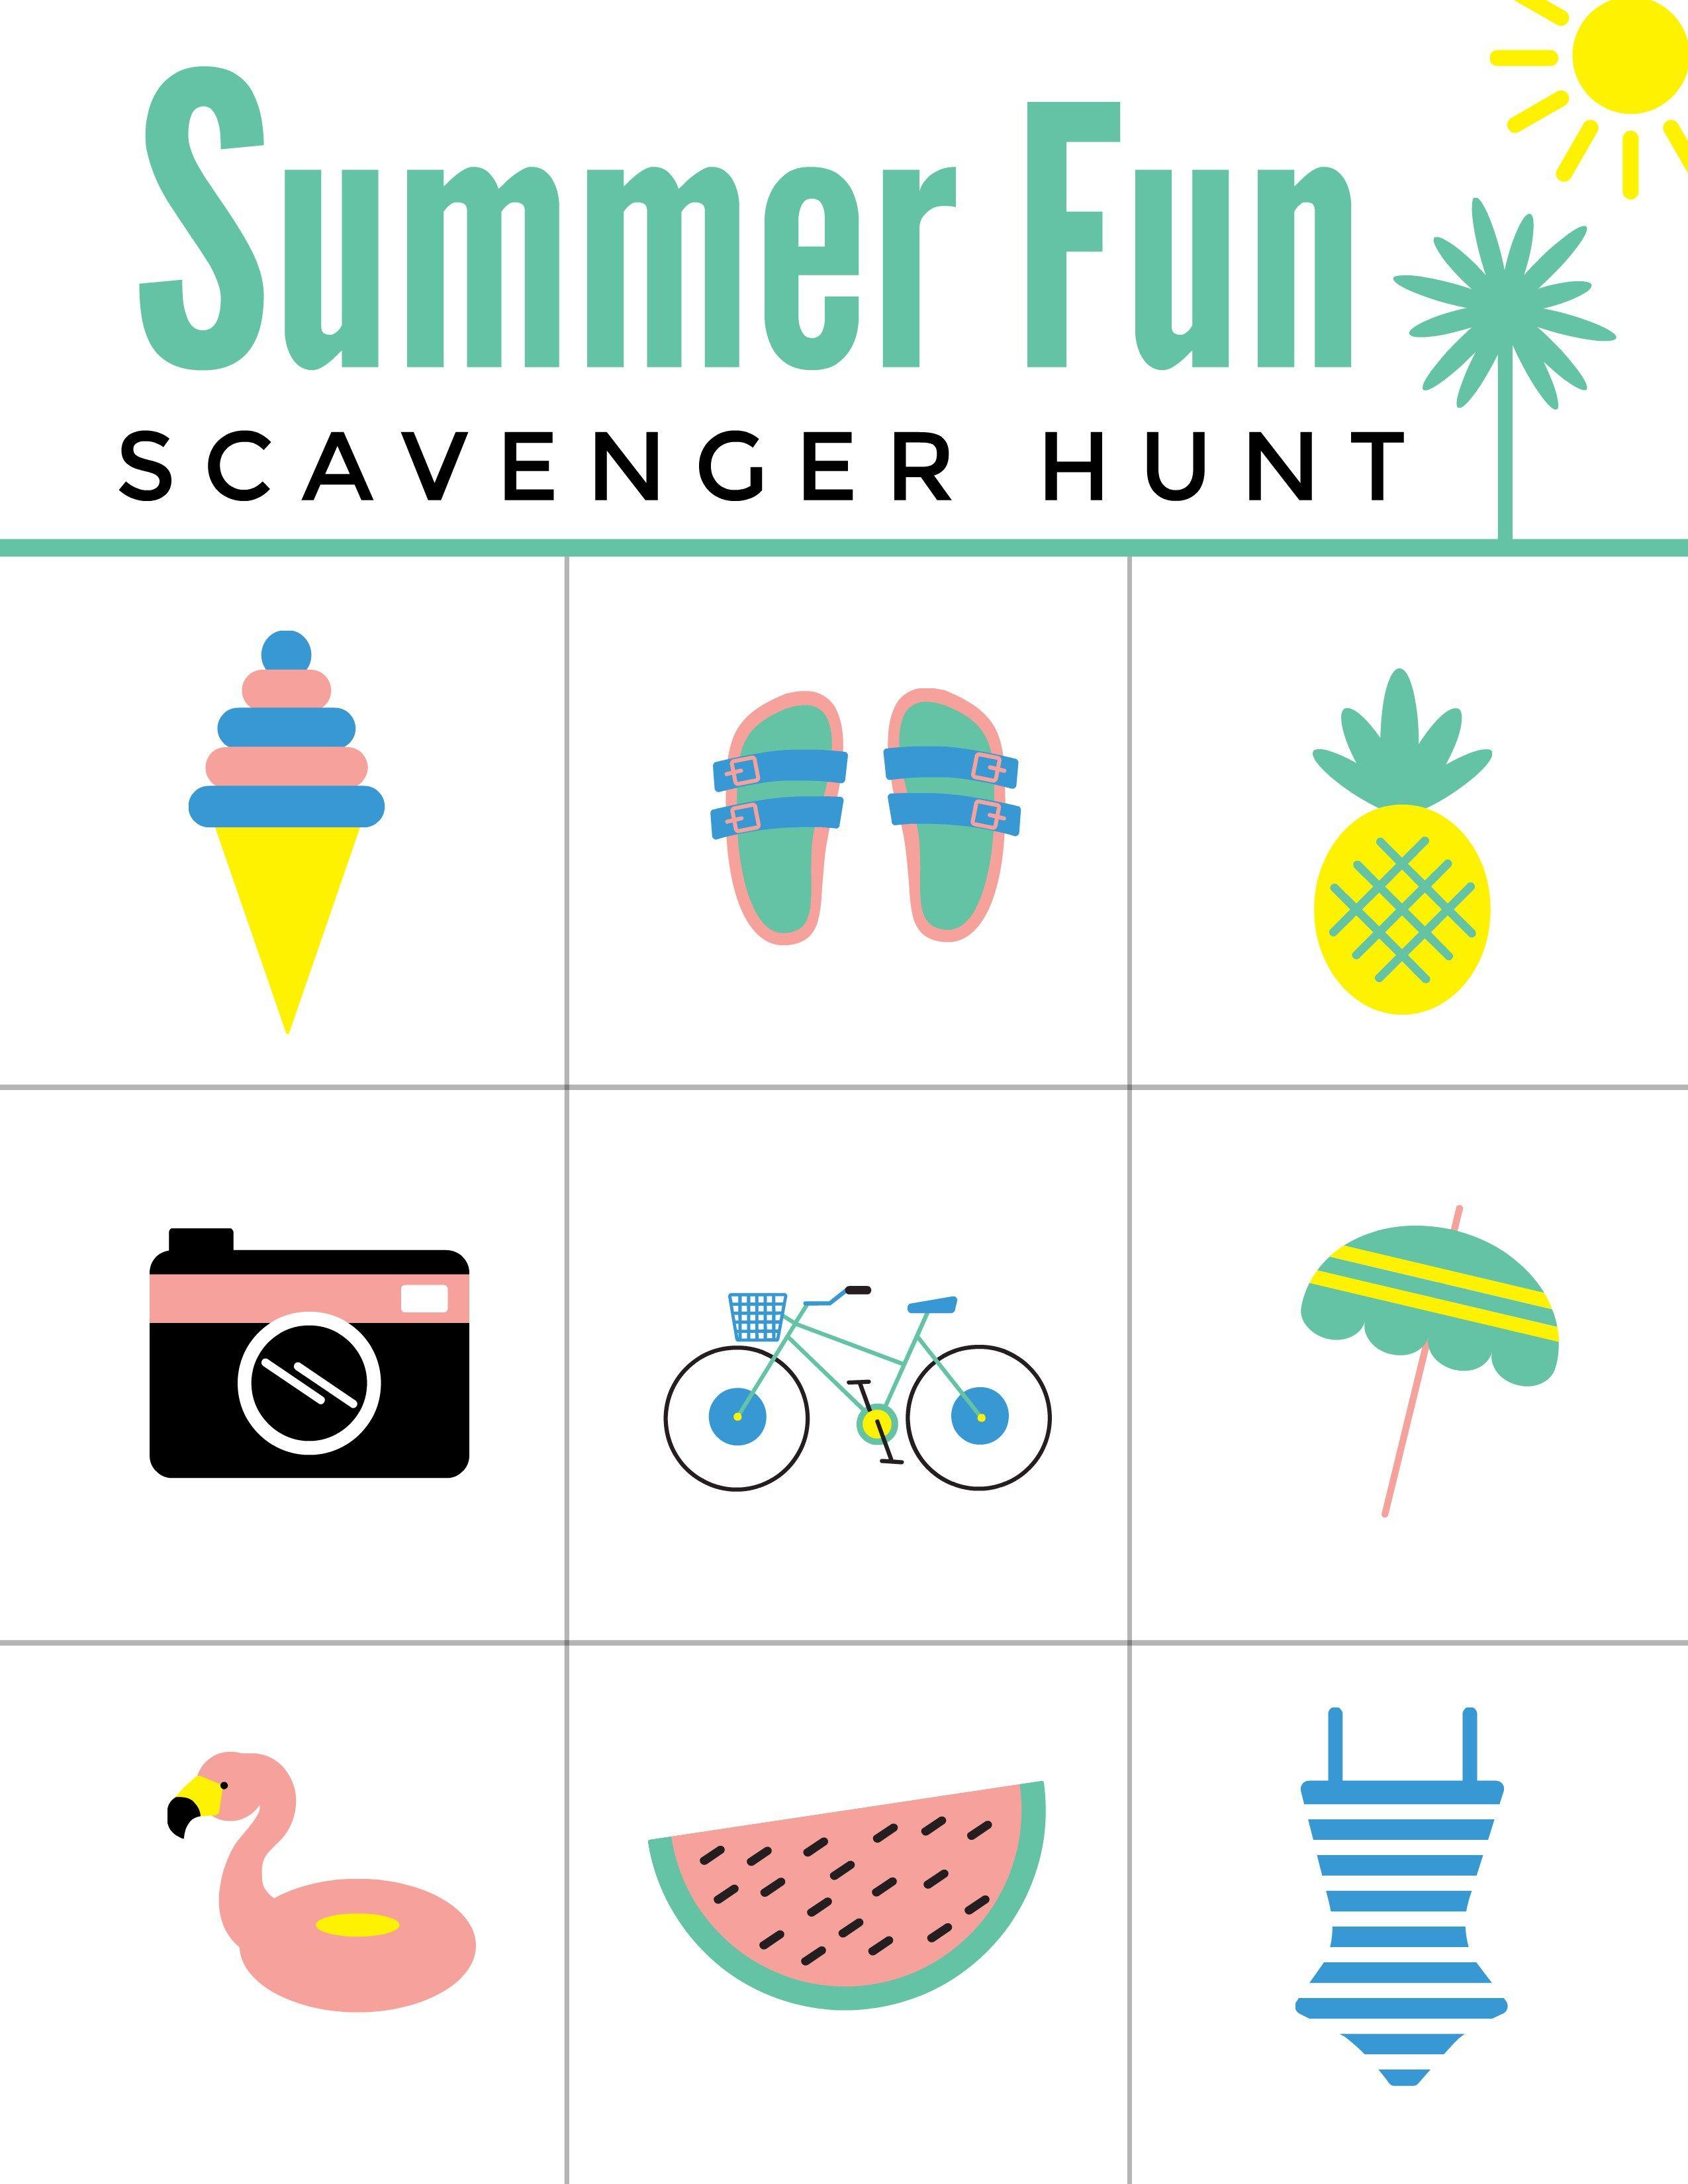 Summer Fun Scavenger Hunt Free Printable Worksheet